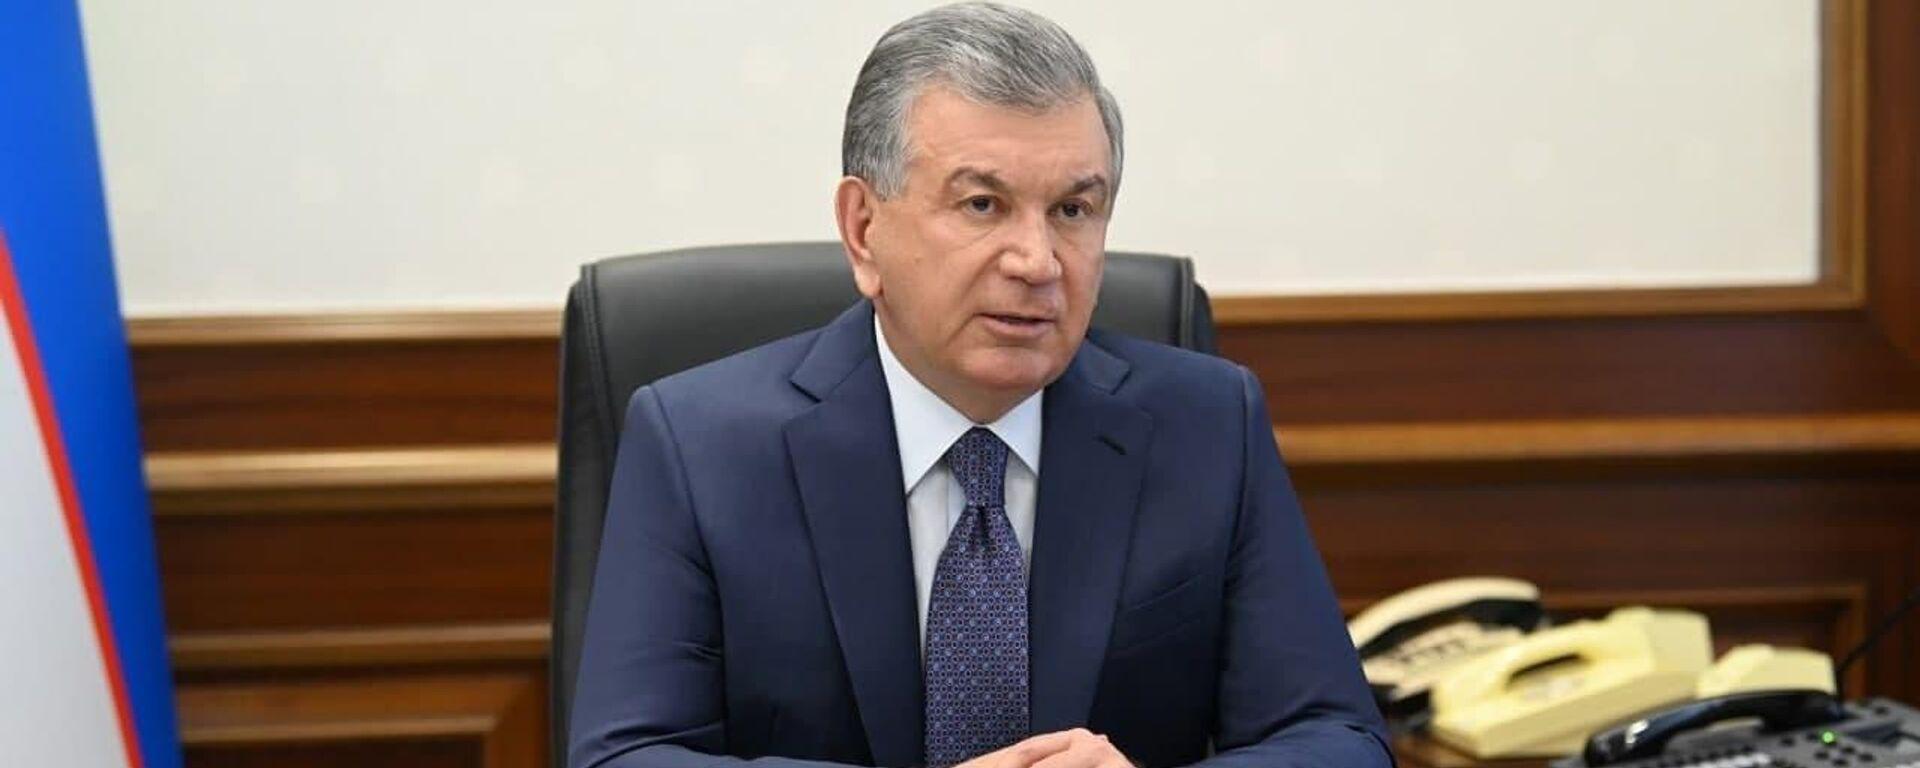 Президент Узбекистана Шавкат Мирзиёев - Sputnik Ўзбекистон, 1920, 23.08.2021